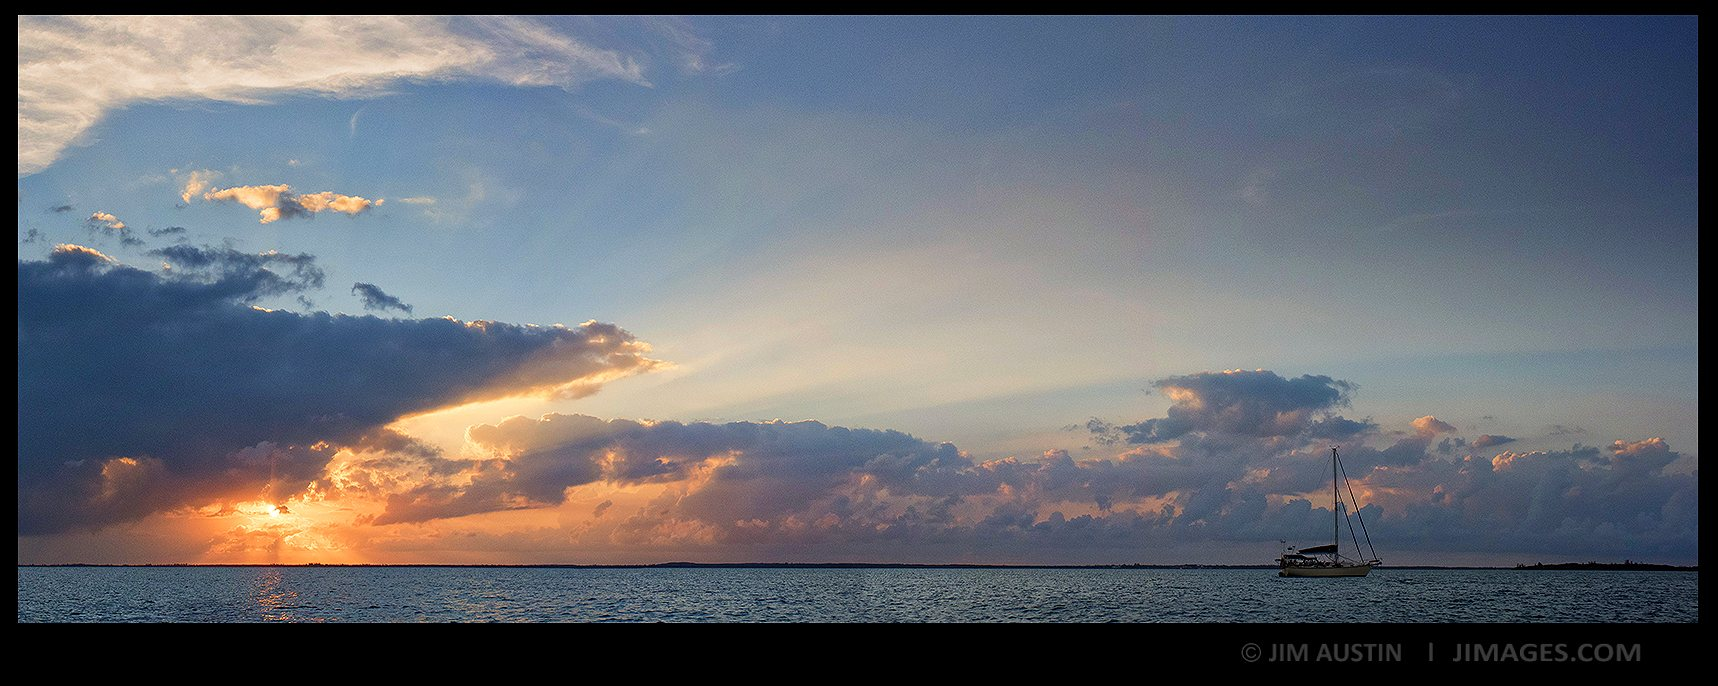 panorama-simple-life-jim-austin-jimages